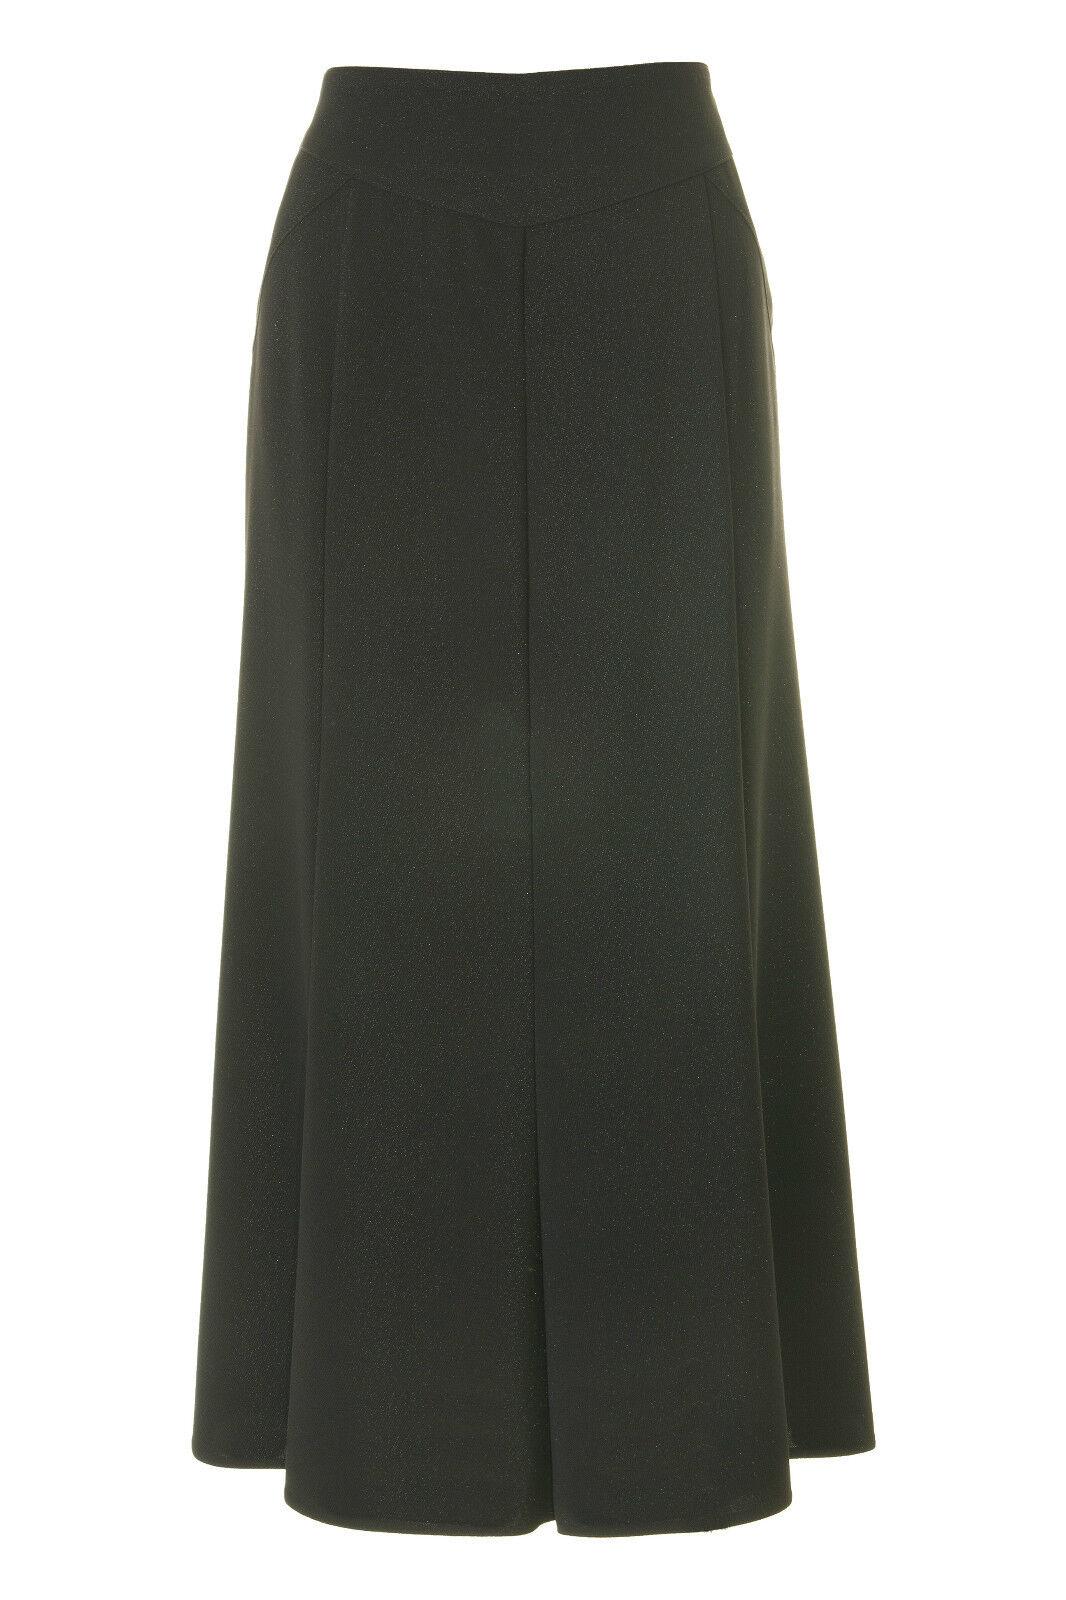 Busy Sparkle Black Long Flared Skirt